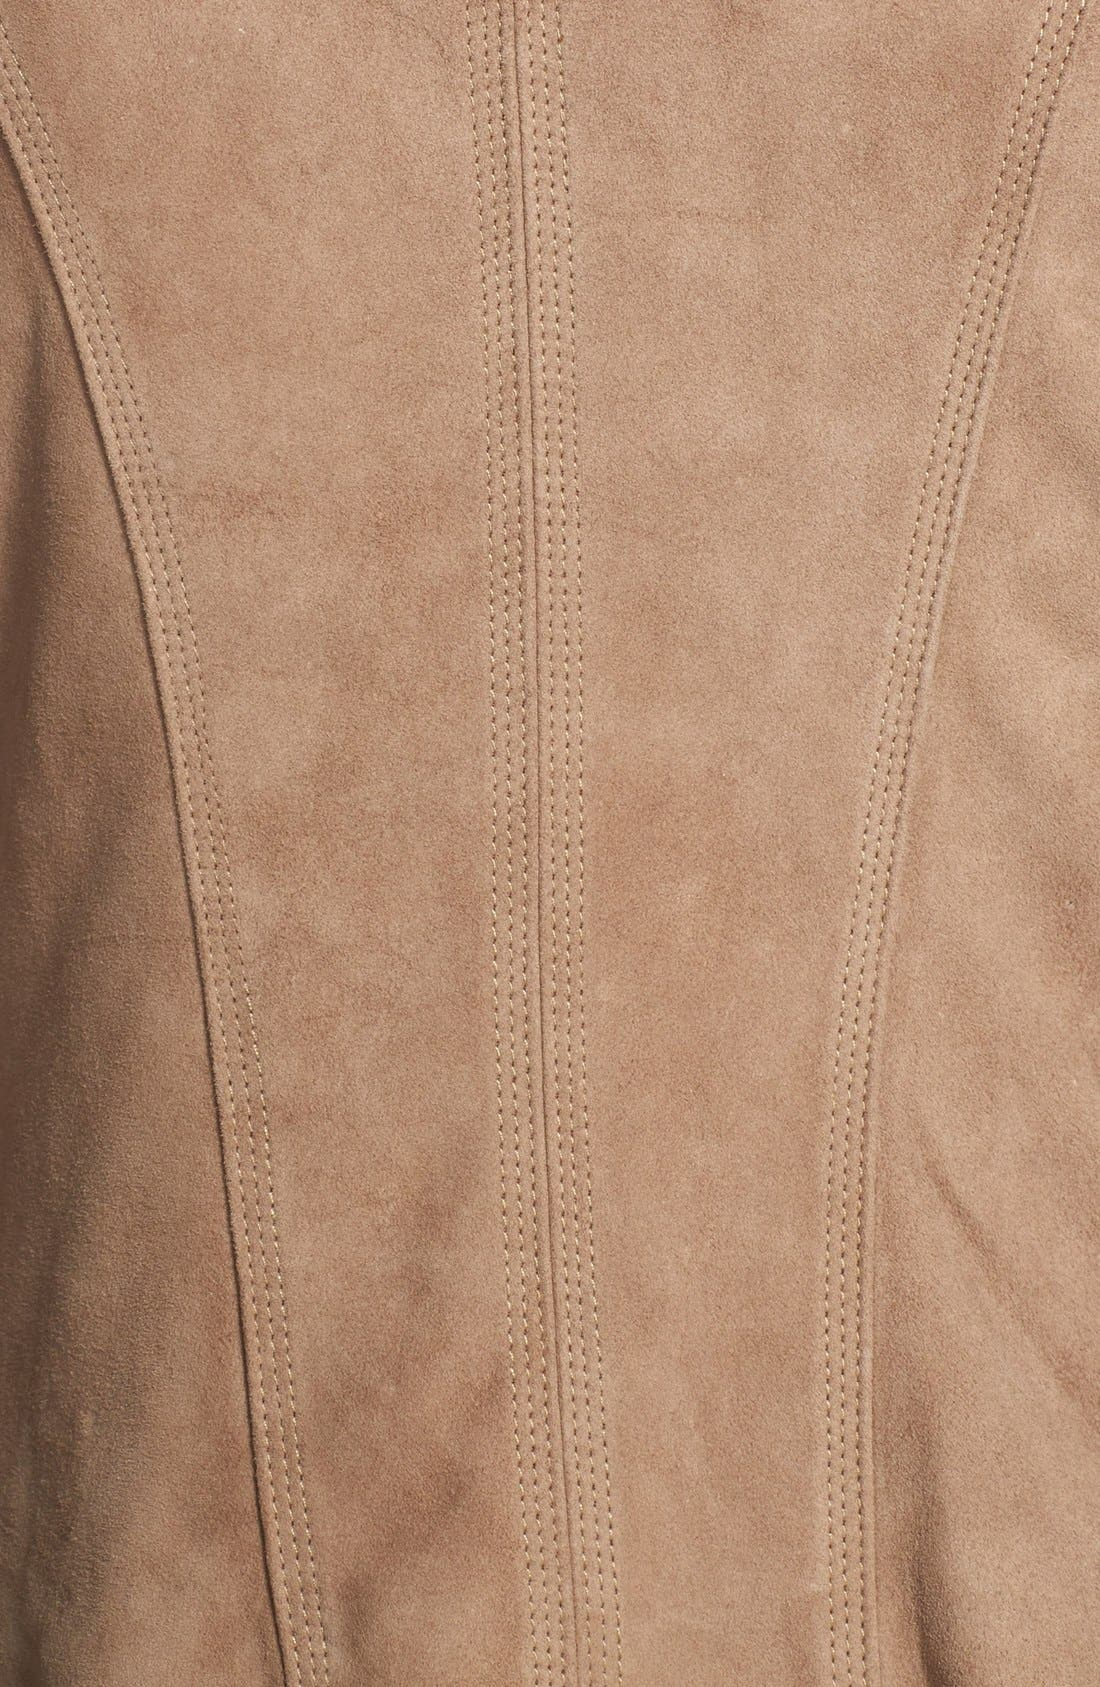 Alternate Image 3  - Blanc Noir Suede Moto Jacket (Online Only)